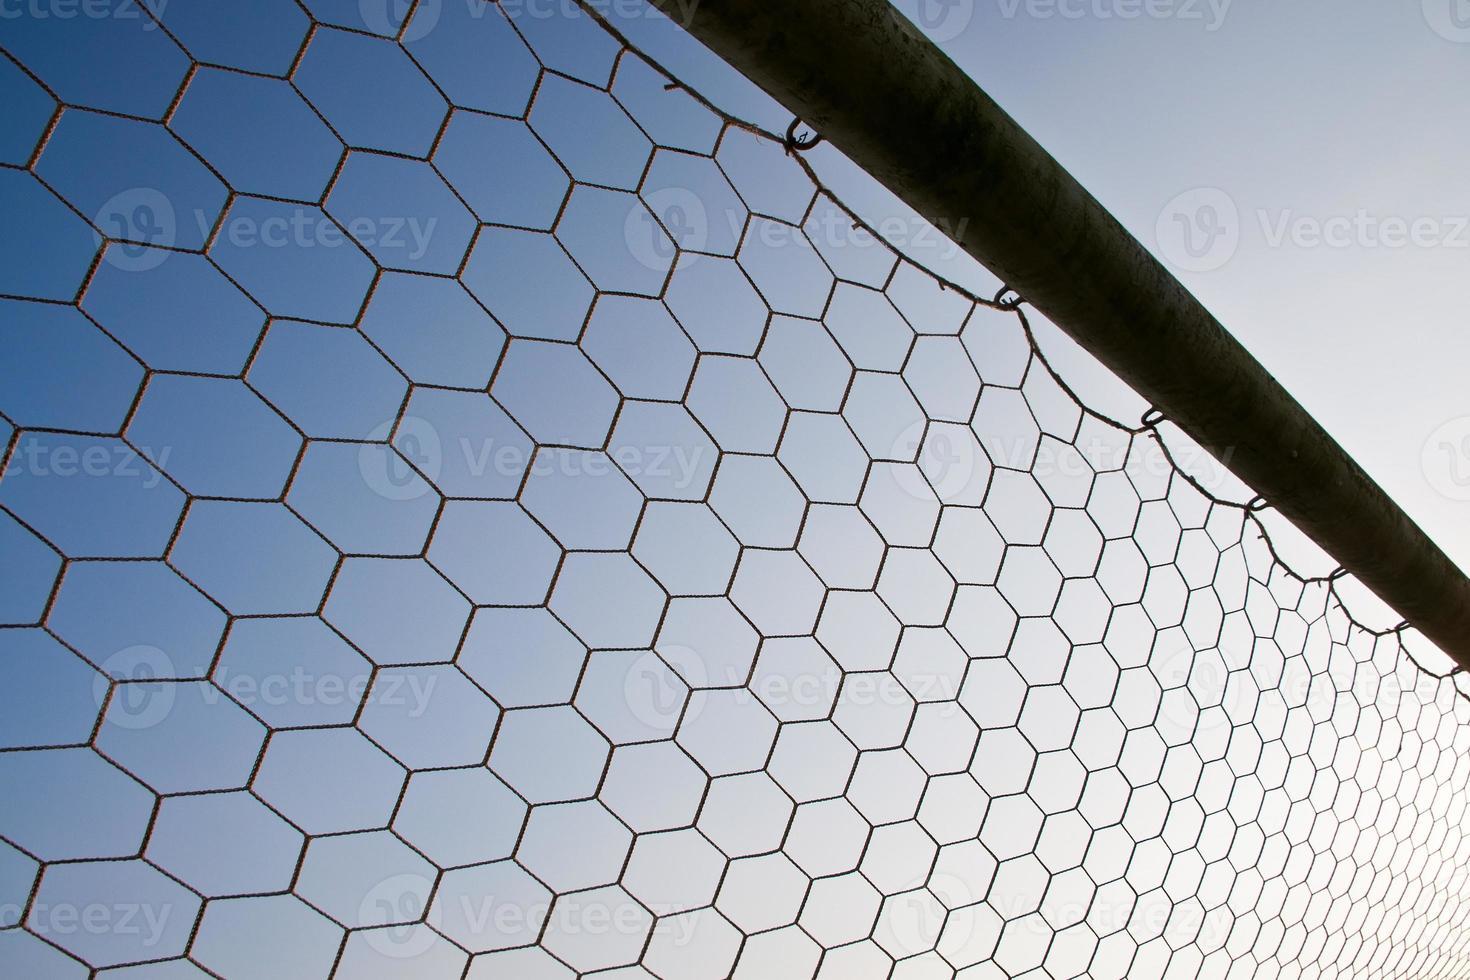 voetbalnet met op blauwe hemelachtergrond foto